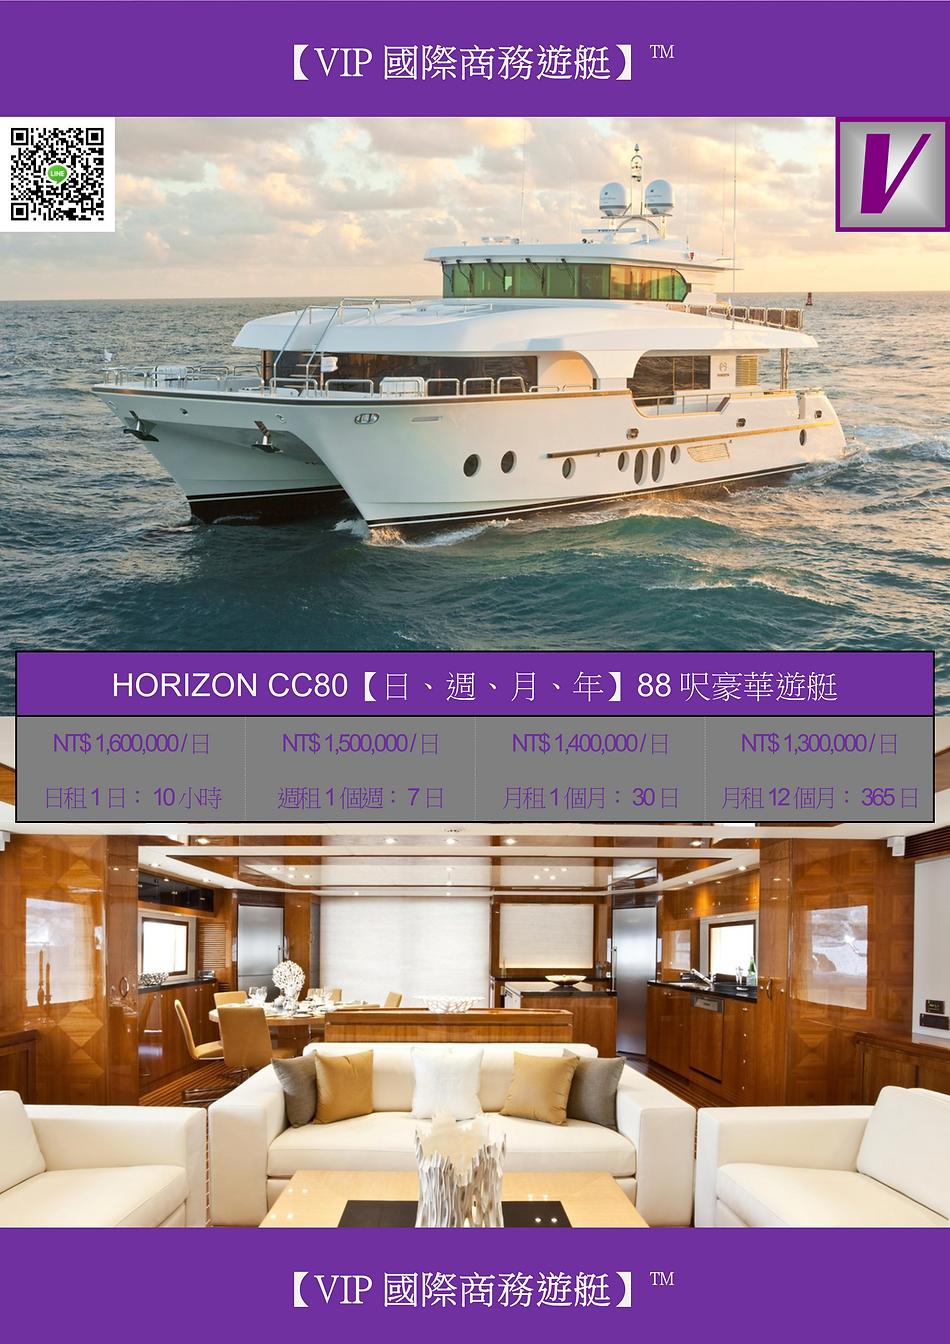 VIP國際商務遊艇 HORIZON YACHT CC80 DM.png